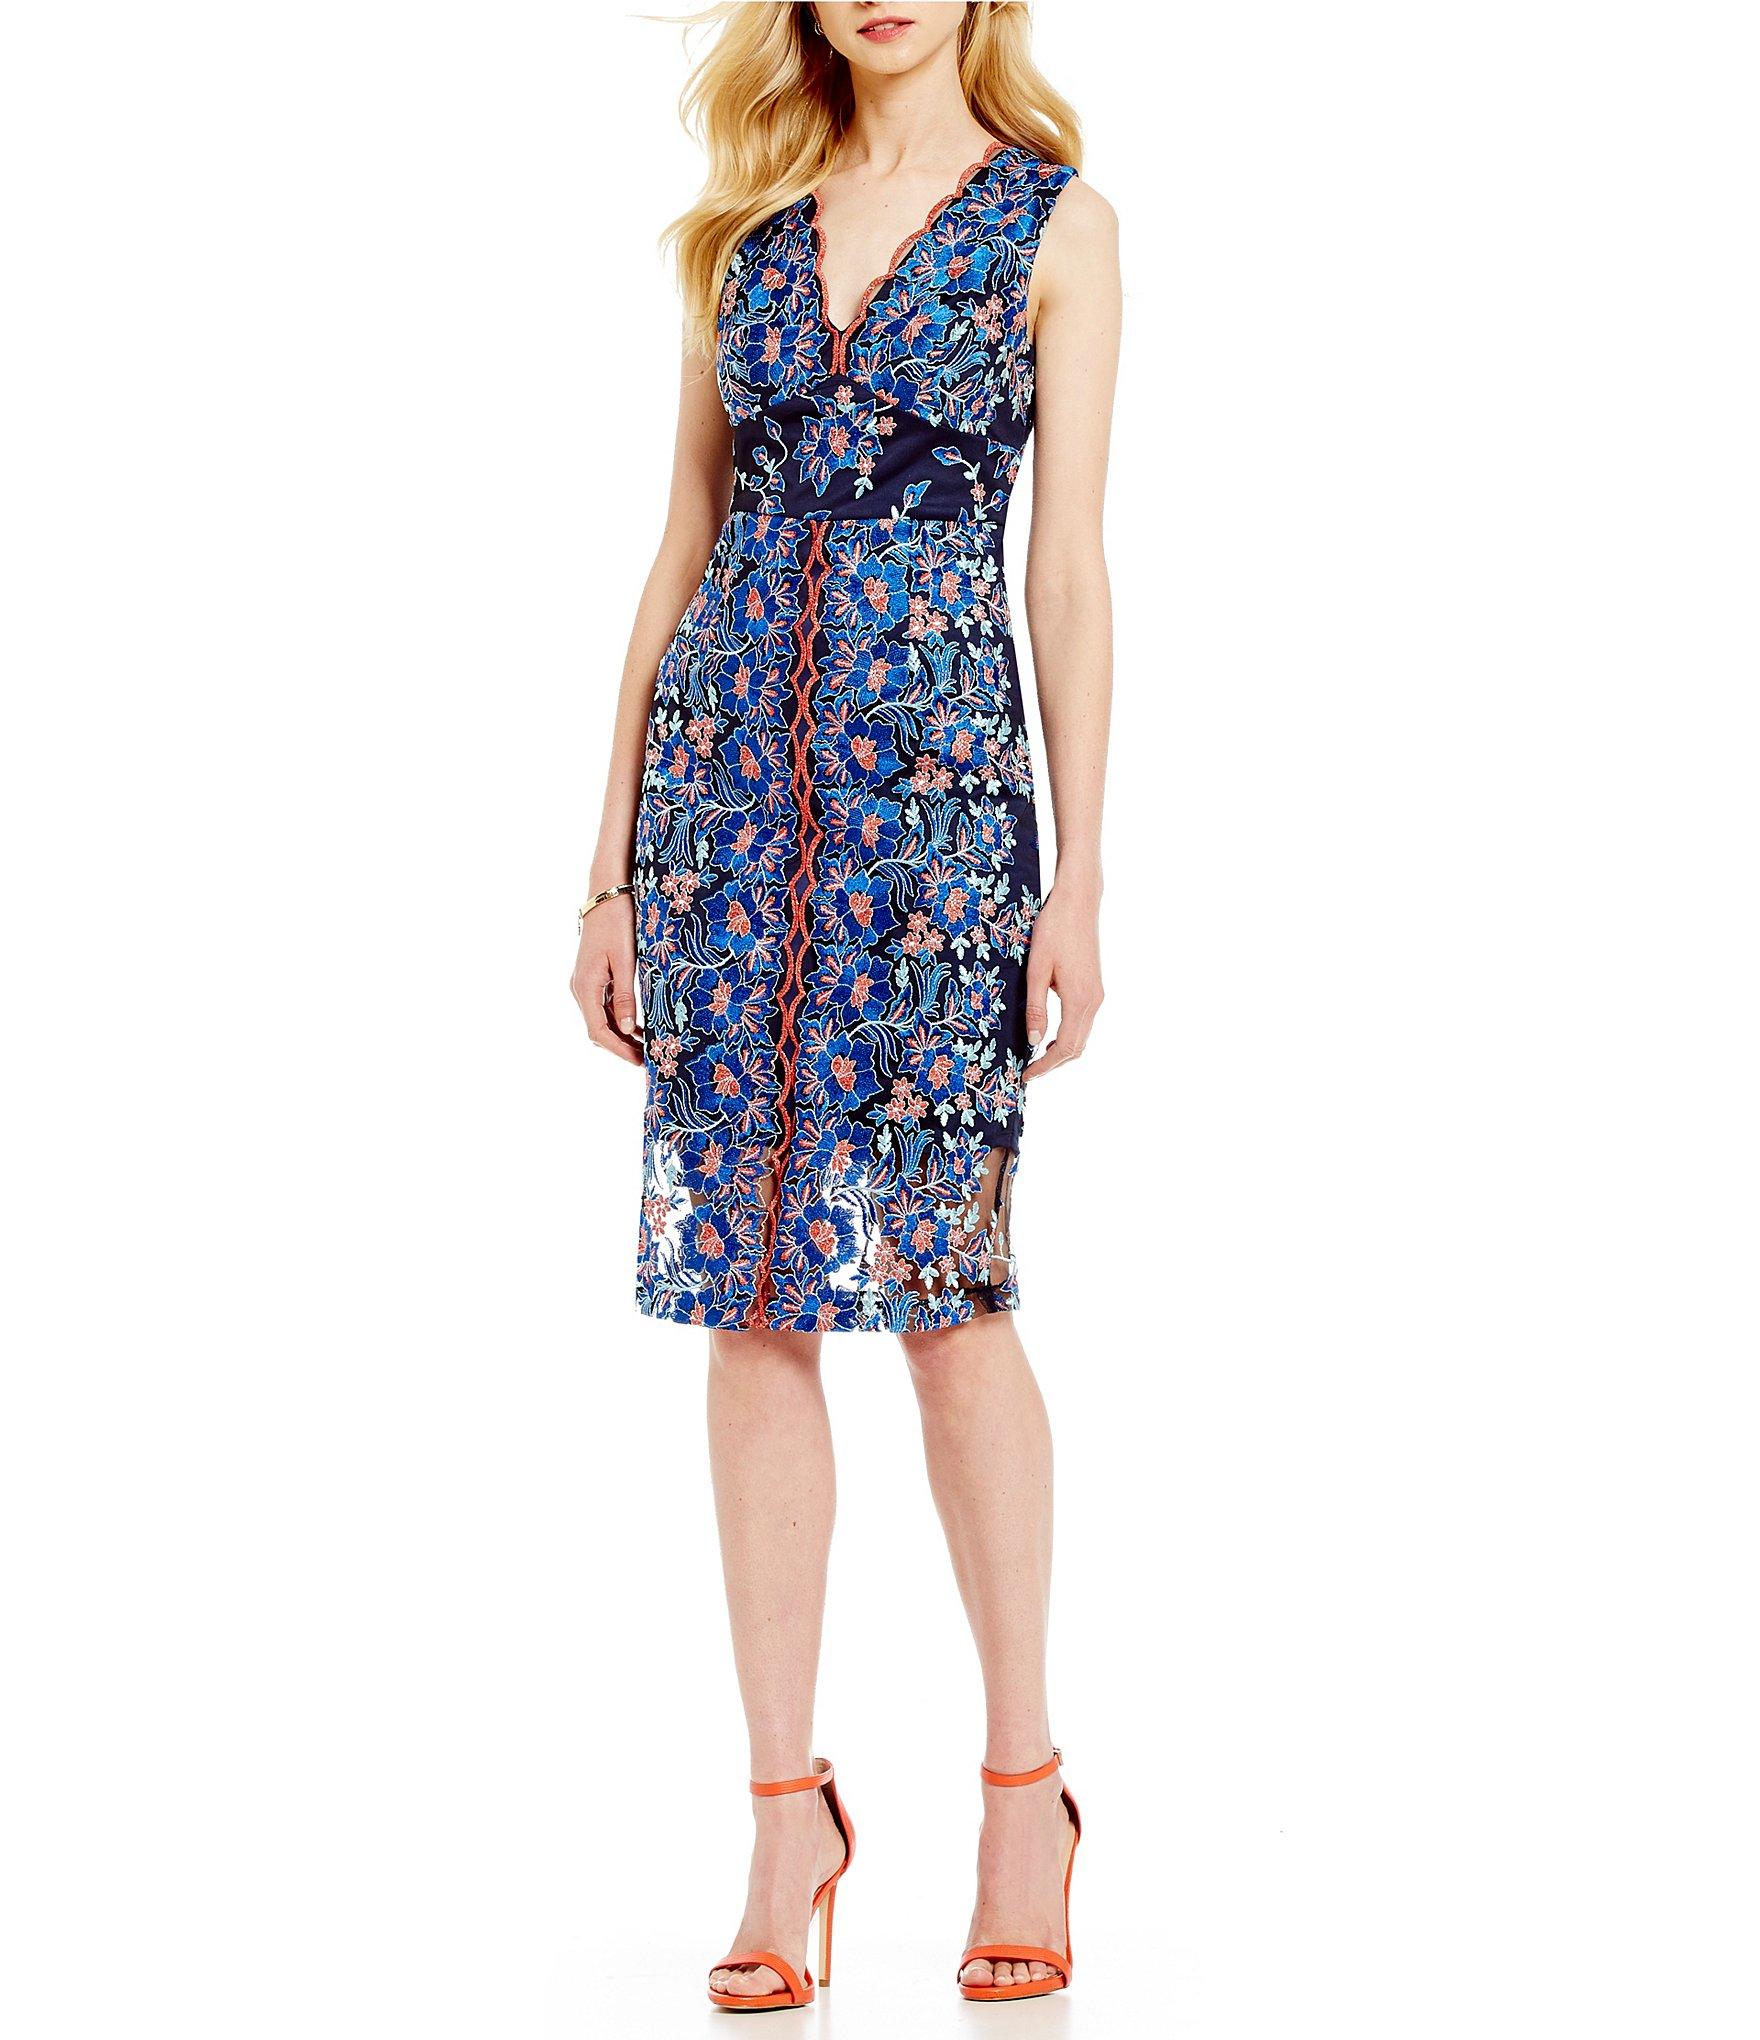 Women\'s Clothing | Dresses | Daytime | Dillards.com